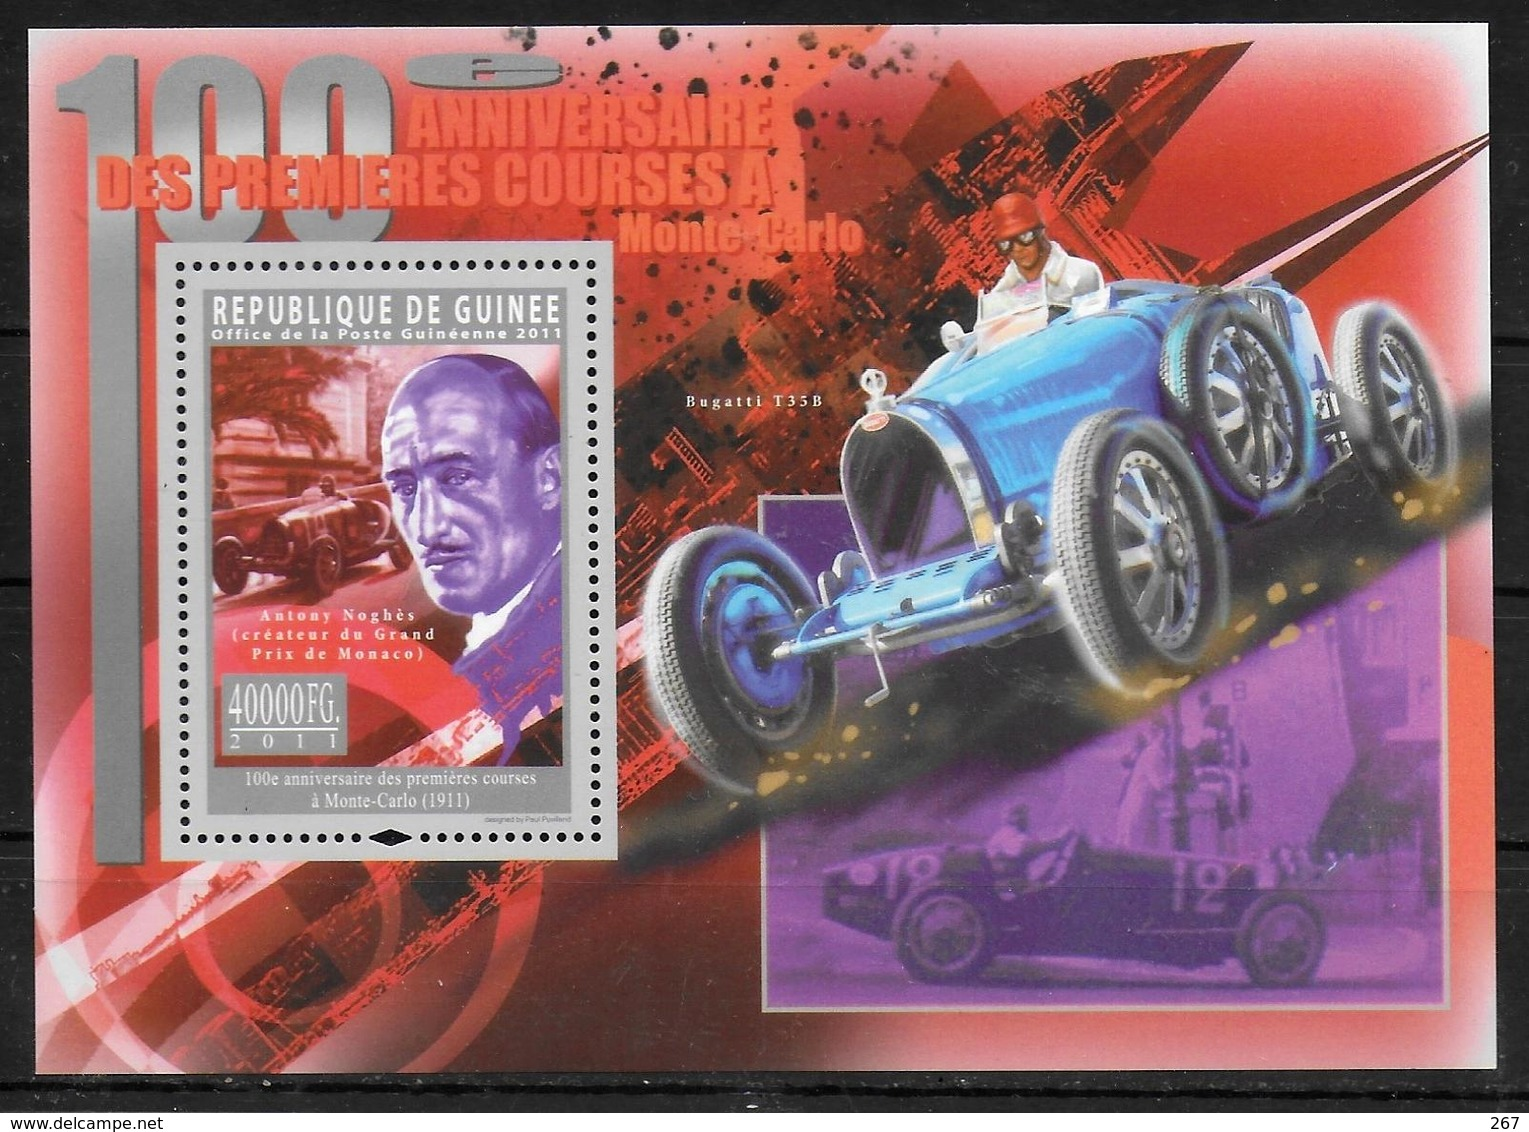 GUINEE  BF 1268  * *  ( Cote 20e ) Automobile Anthony Noghes Prix De Monaco - Automobilismo